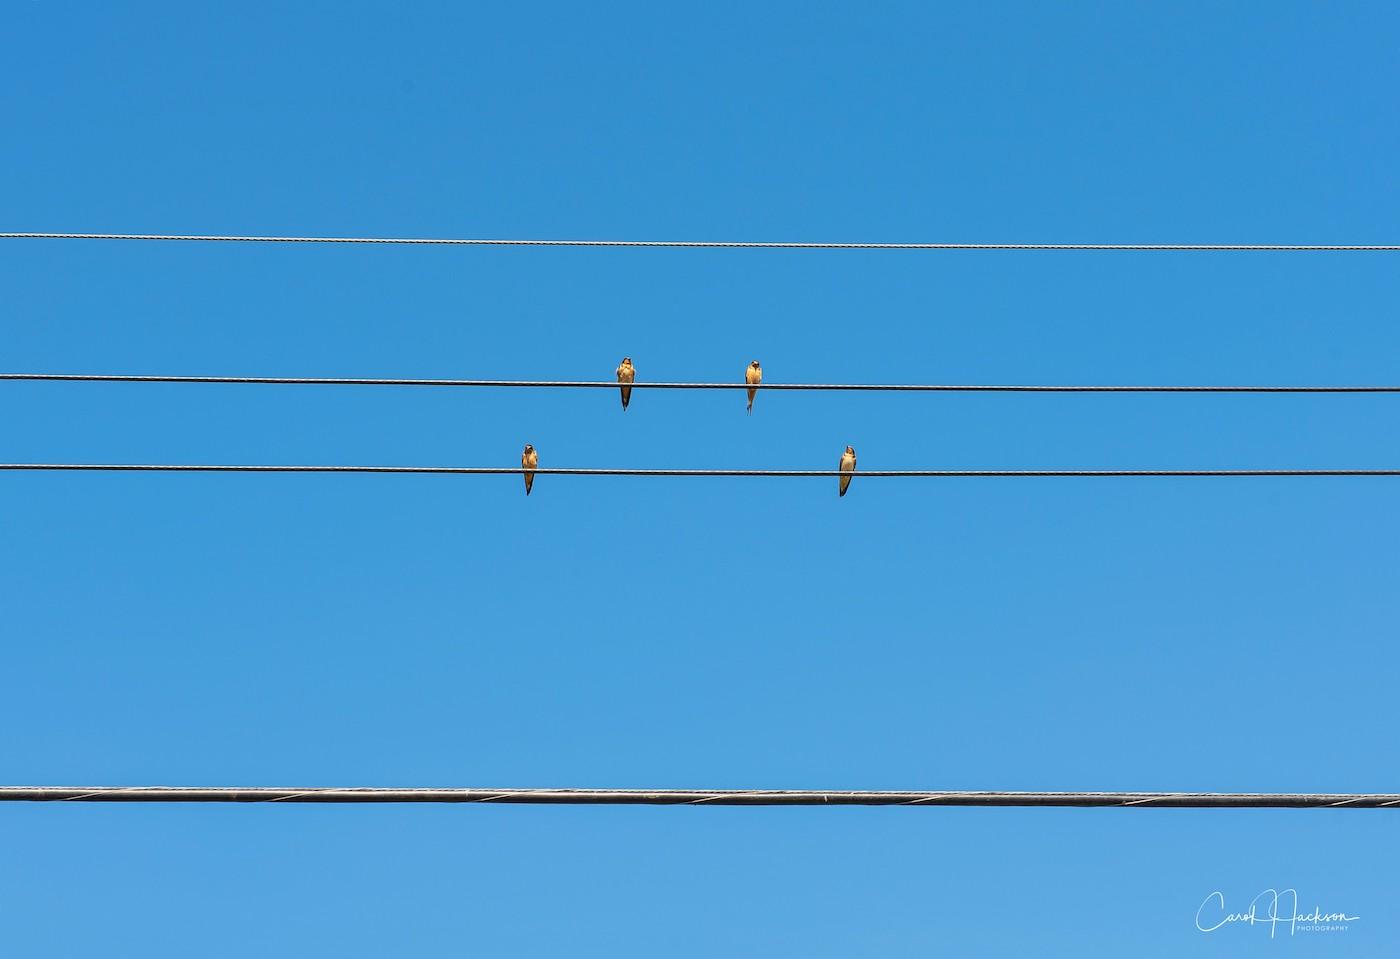 Birds-On-A-Wire-CJJ